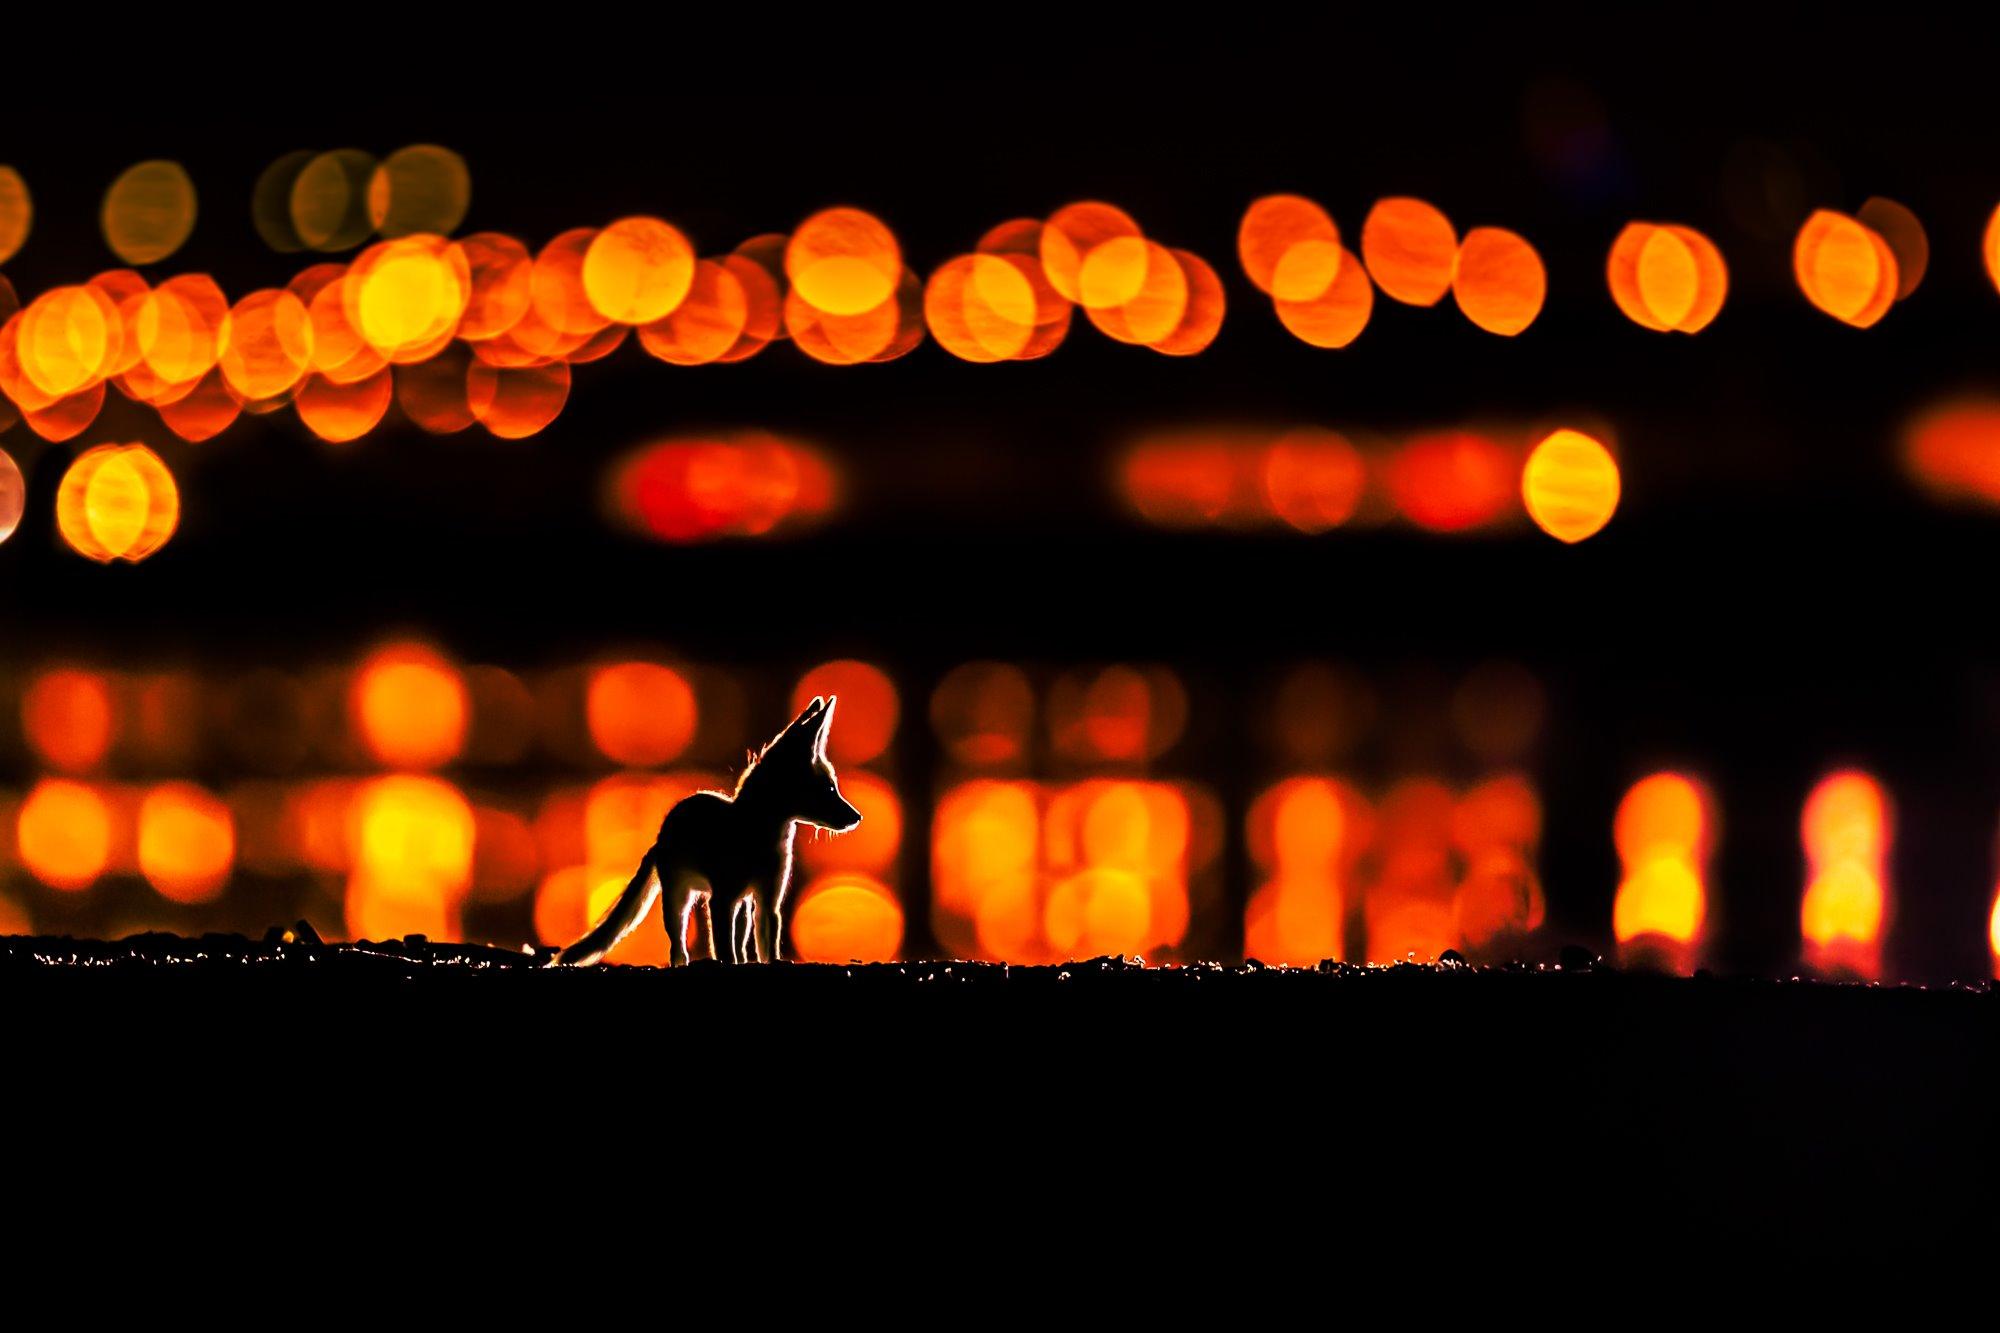 The Fox of Arabia